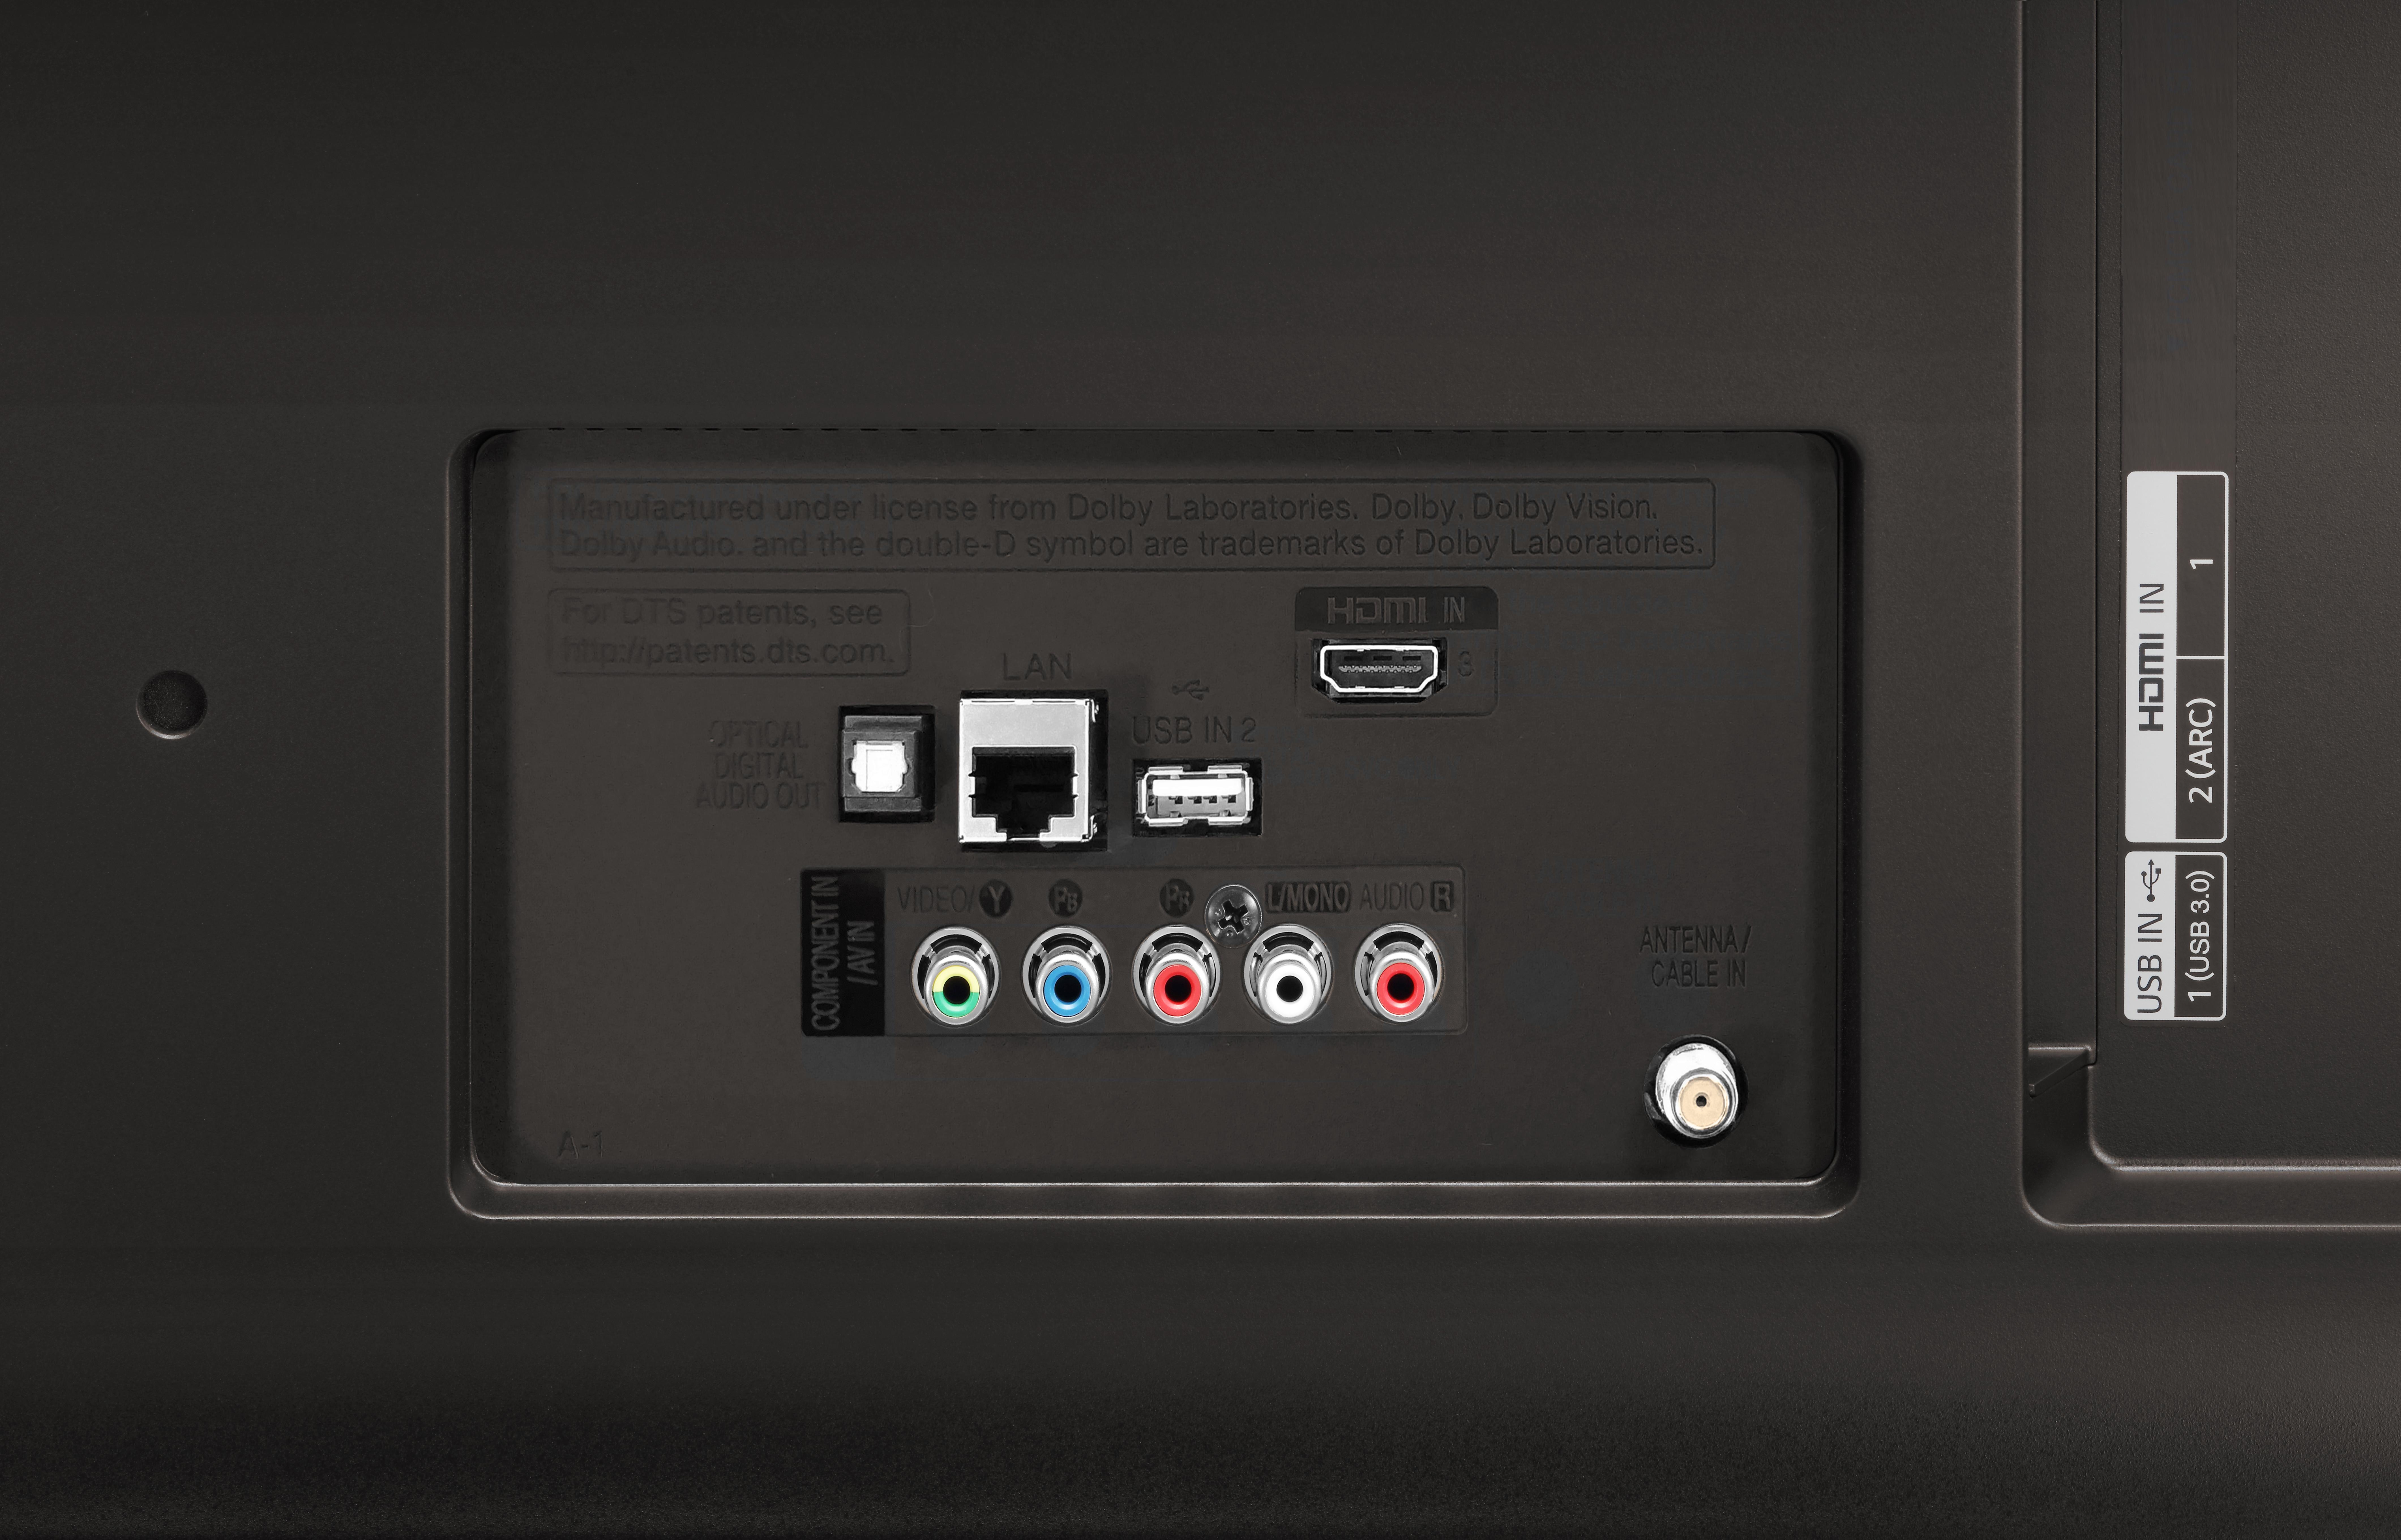 brand new lg 49uj6300 49uj6500 49 4k uhd hdr smart led tv 49uj6300 190403084643 ebay. Black Bedroom Furniture Sets. Home Design Ideas